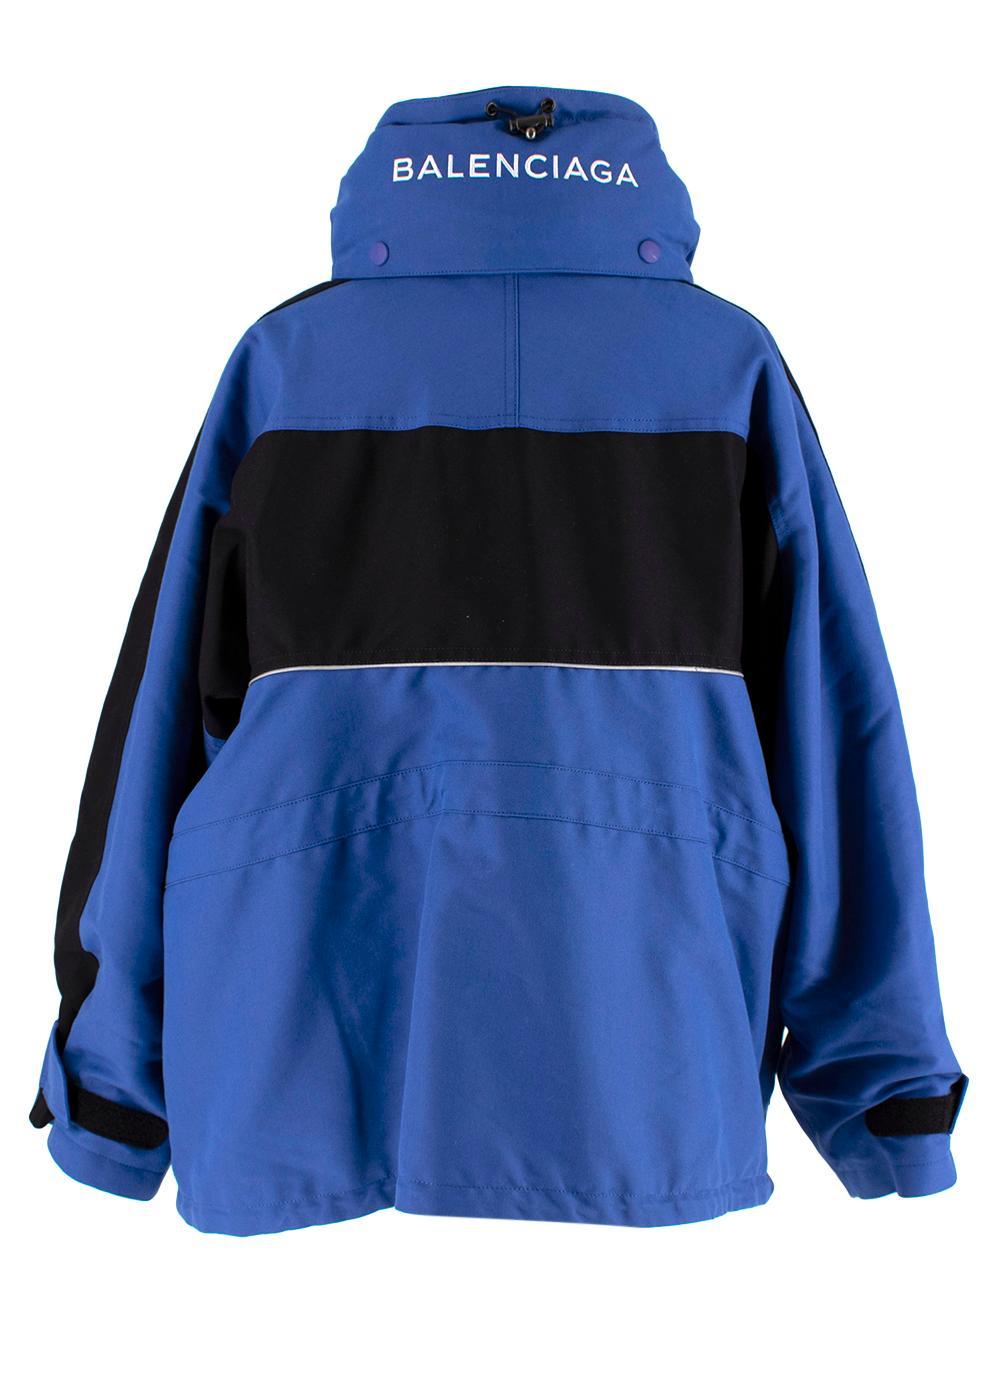 Vintage AirField Womens Black Jacket Coat Embellished Padded size D42IT46UK14US10L